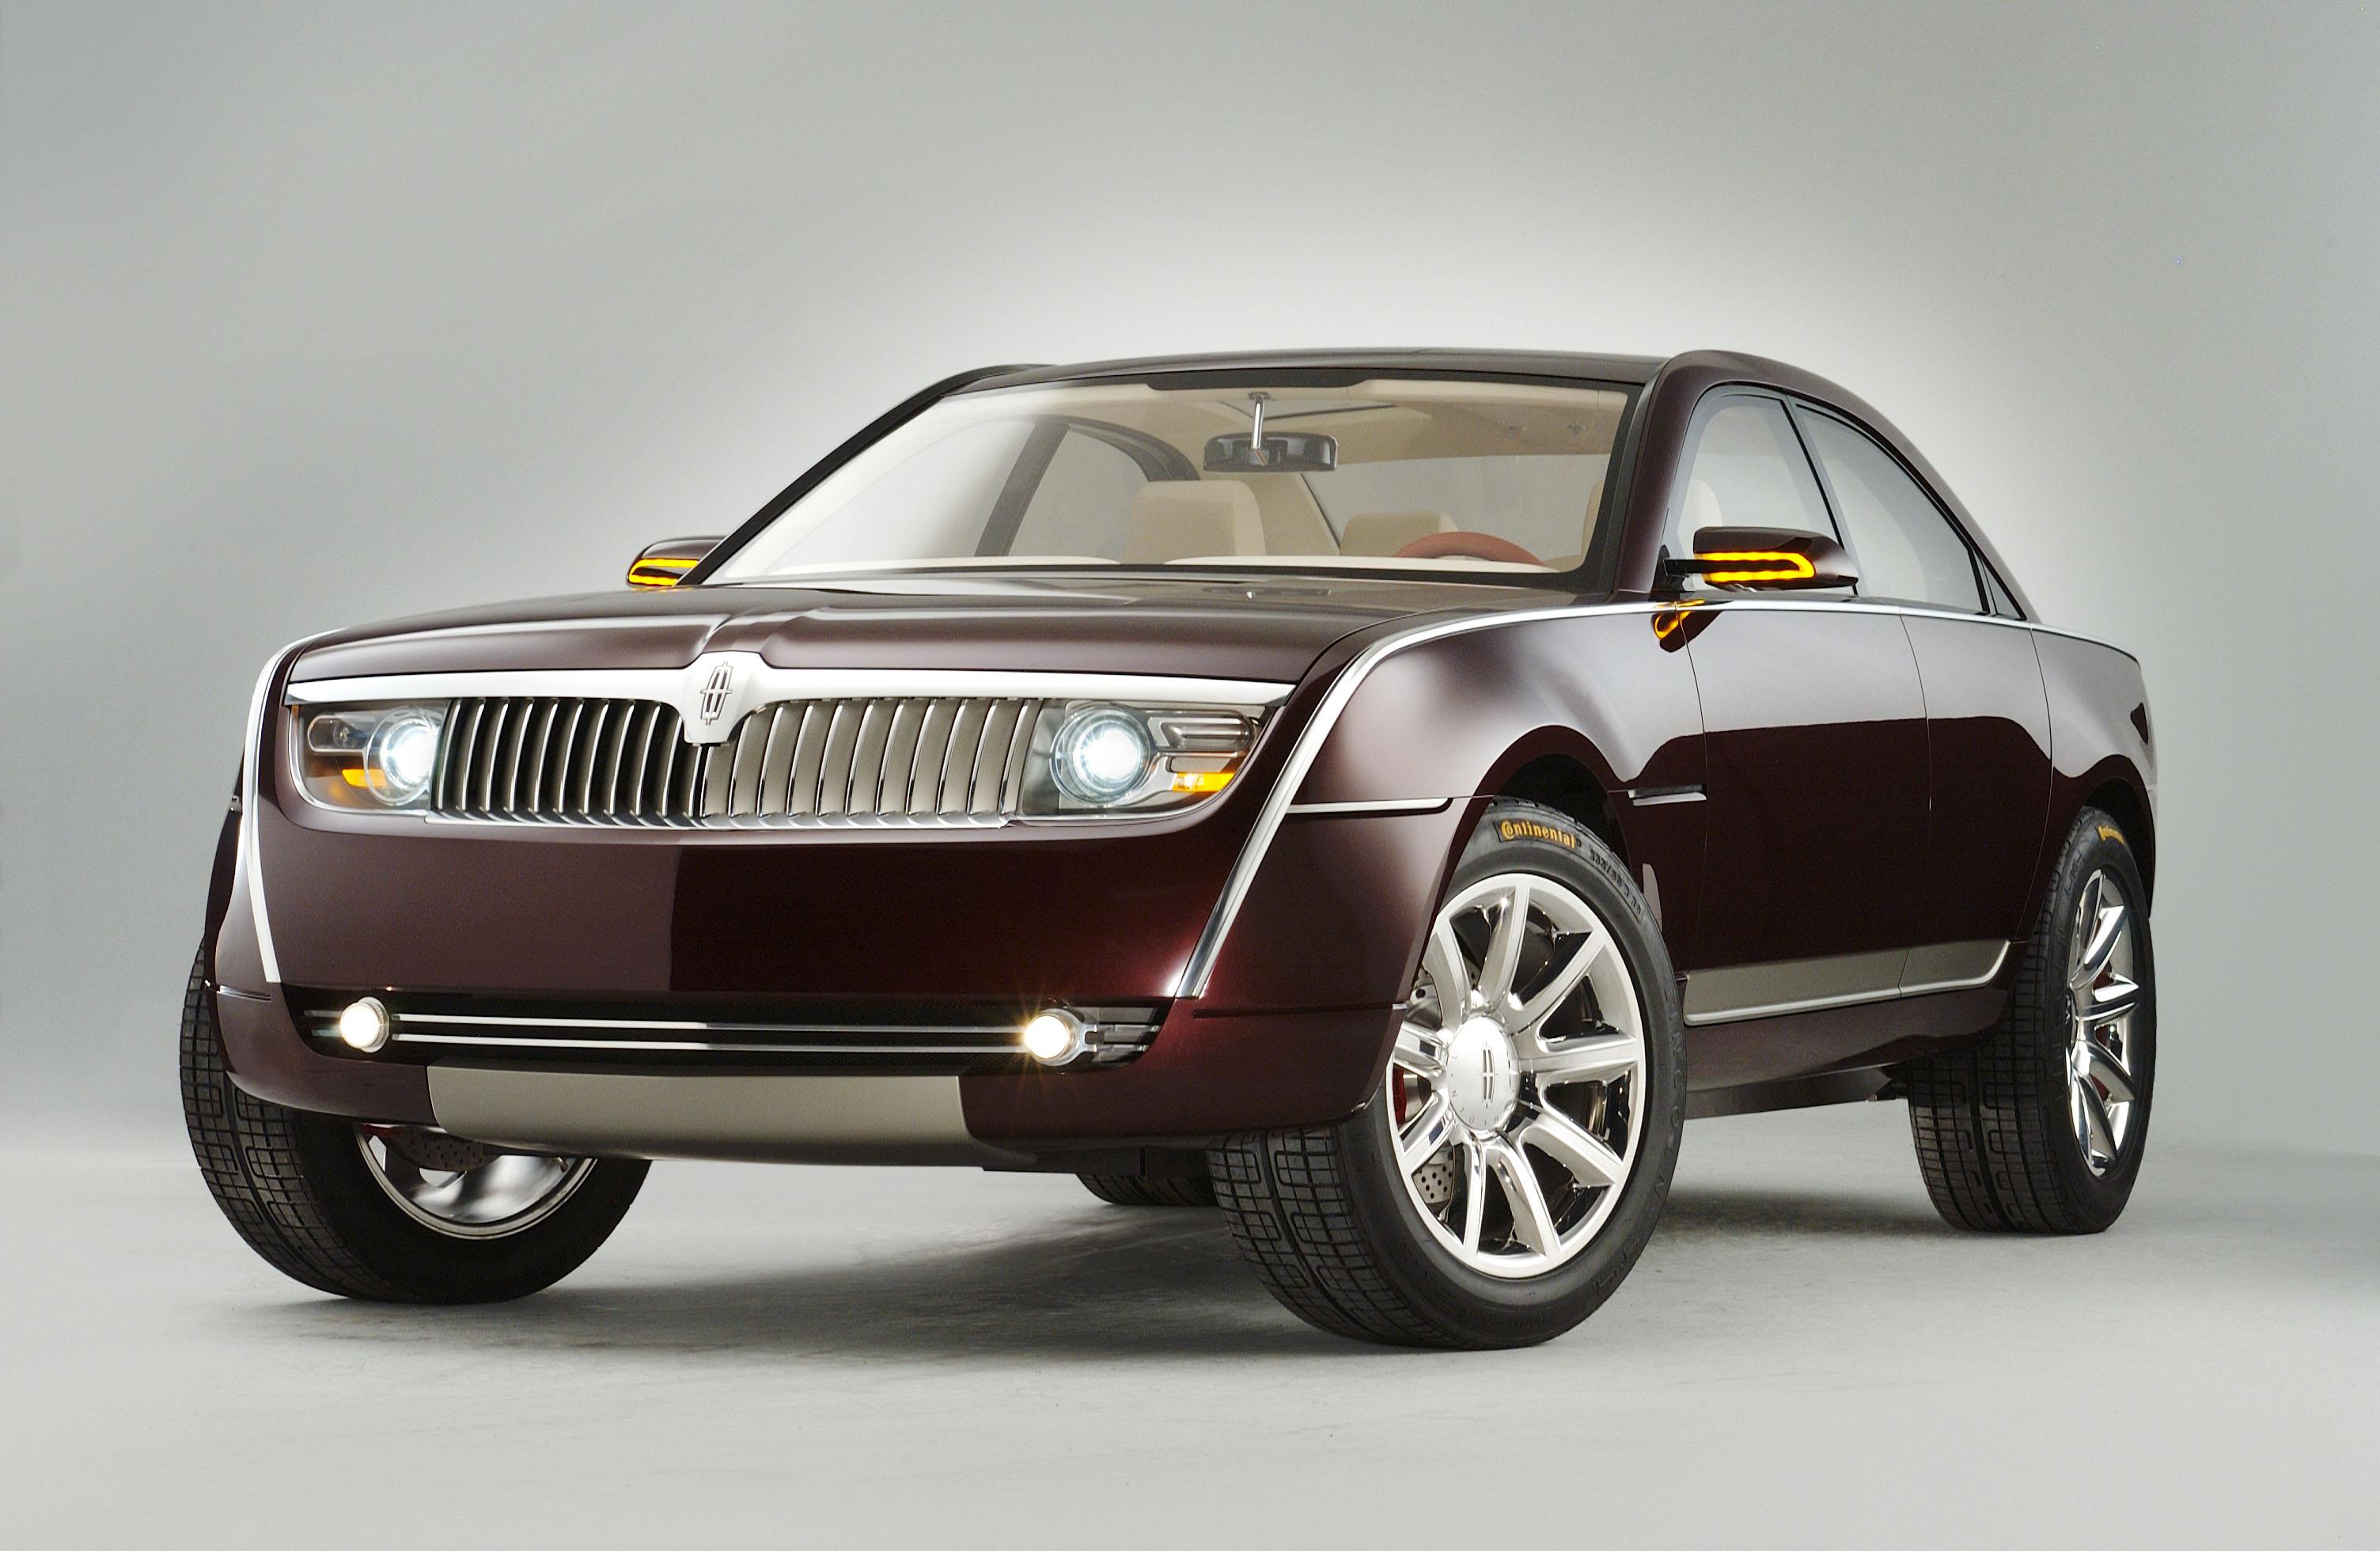 https://www.automobilesreview.com/gallery/navicross-concept/lincoln-navicross-concept-02.jpg